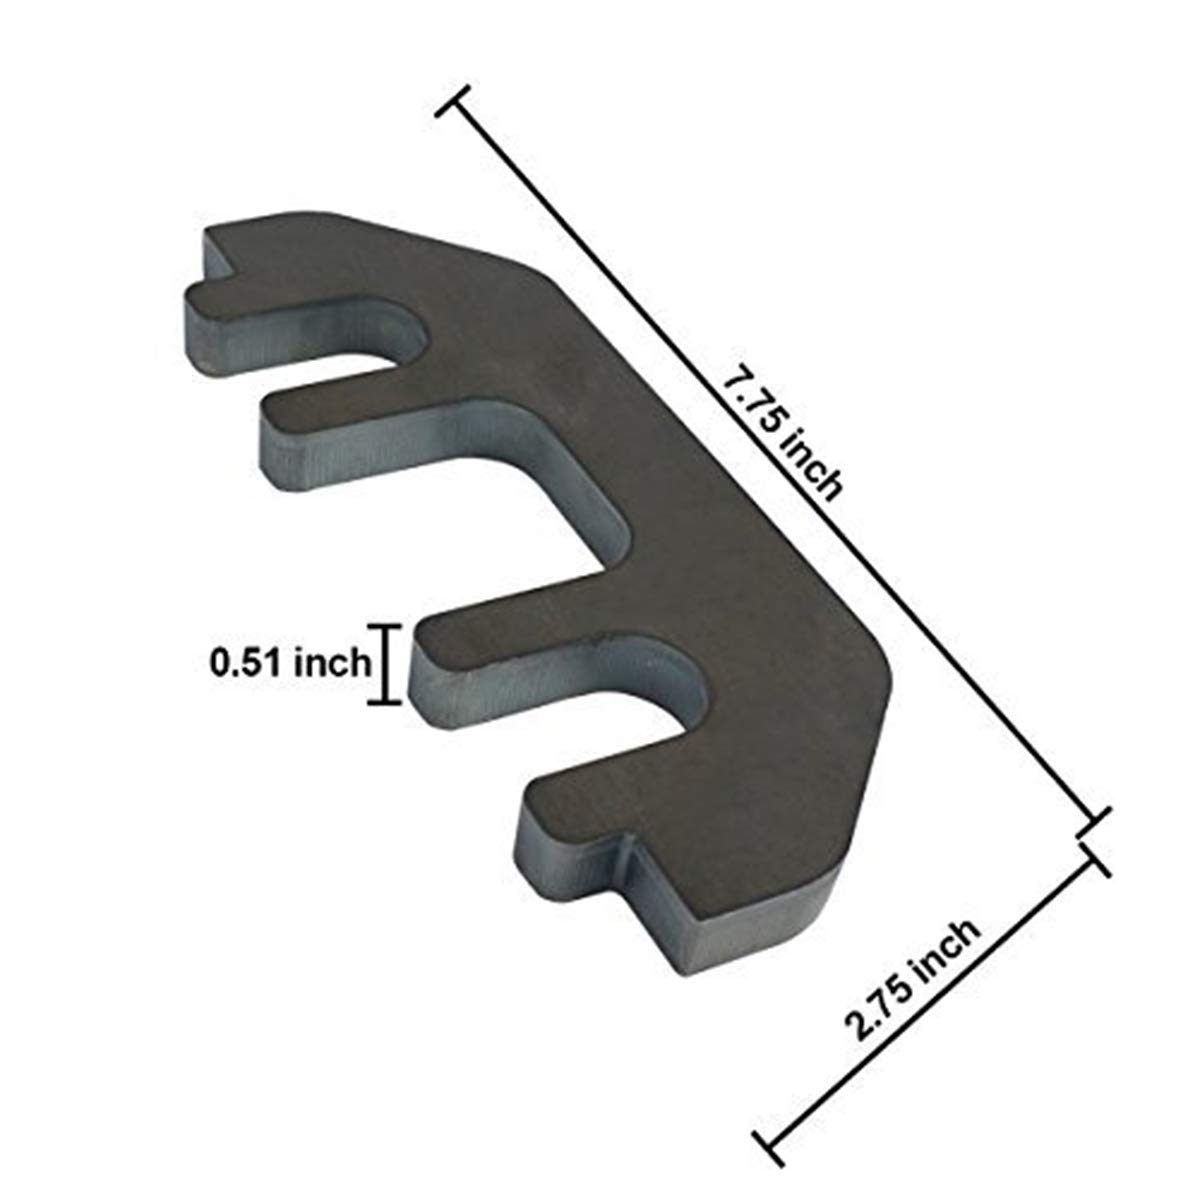 Genuine Hyundai 97314-26000-YD Defroster Nozzle Cover Left